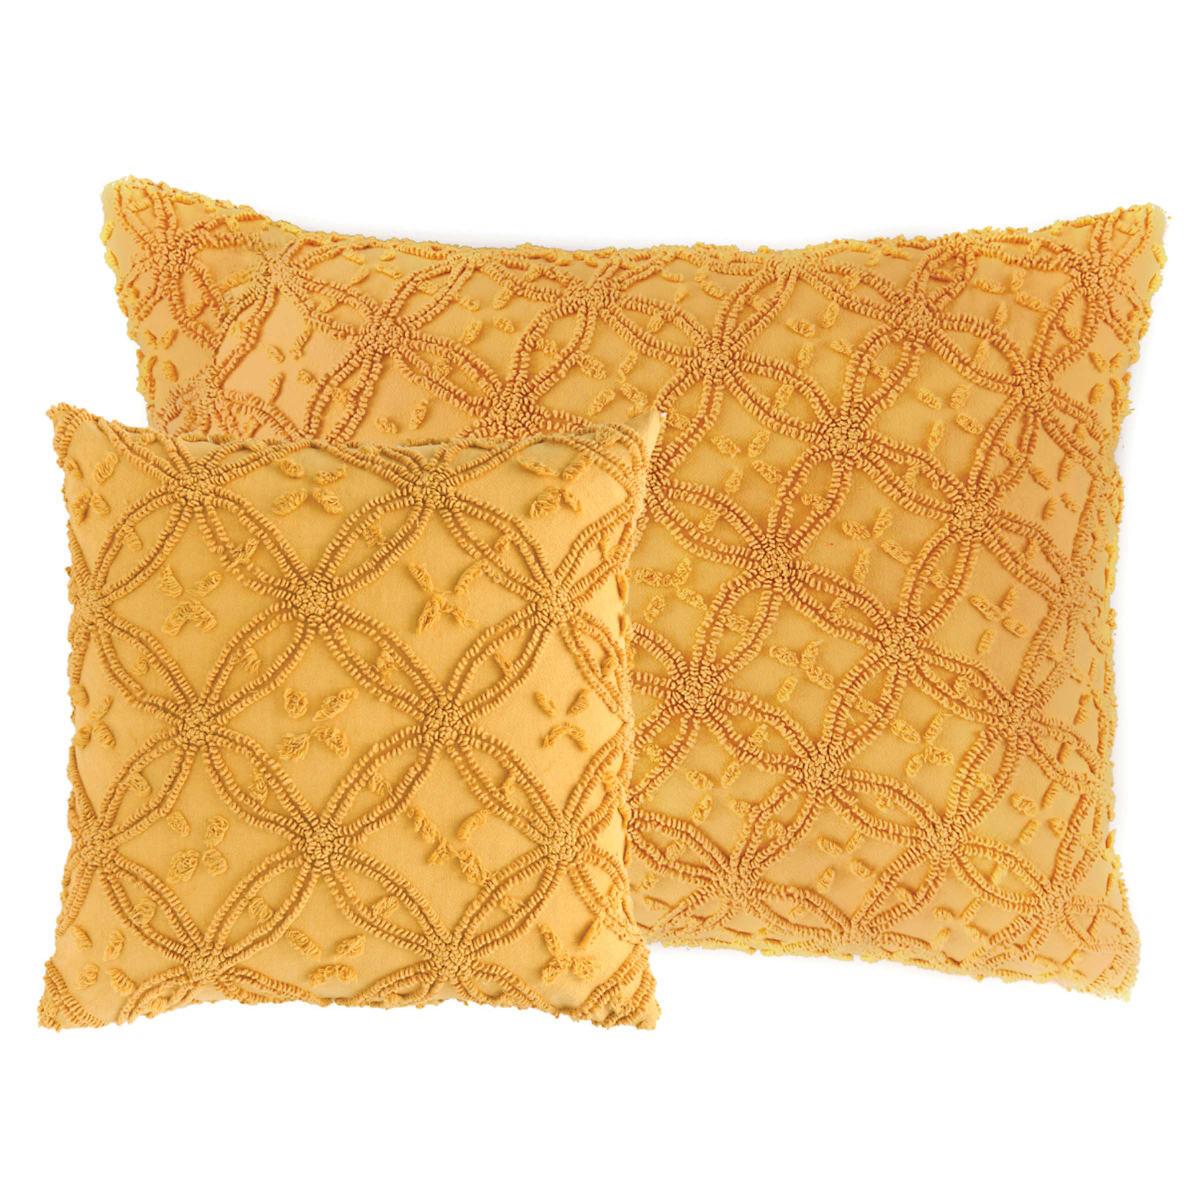 Candlewick Curry Decorative Pillows